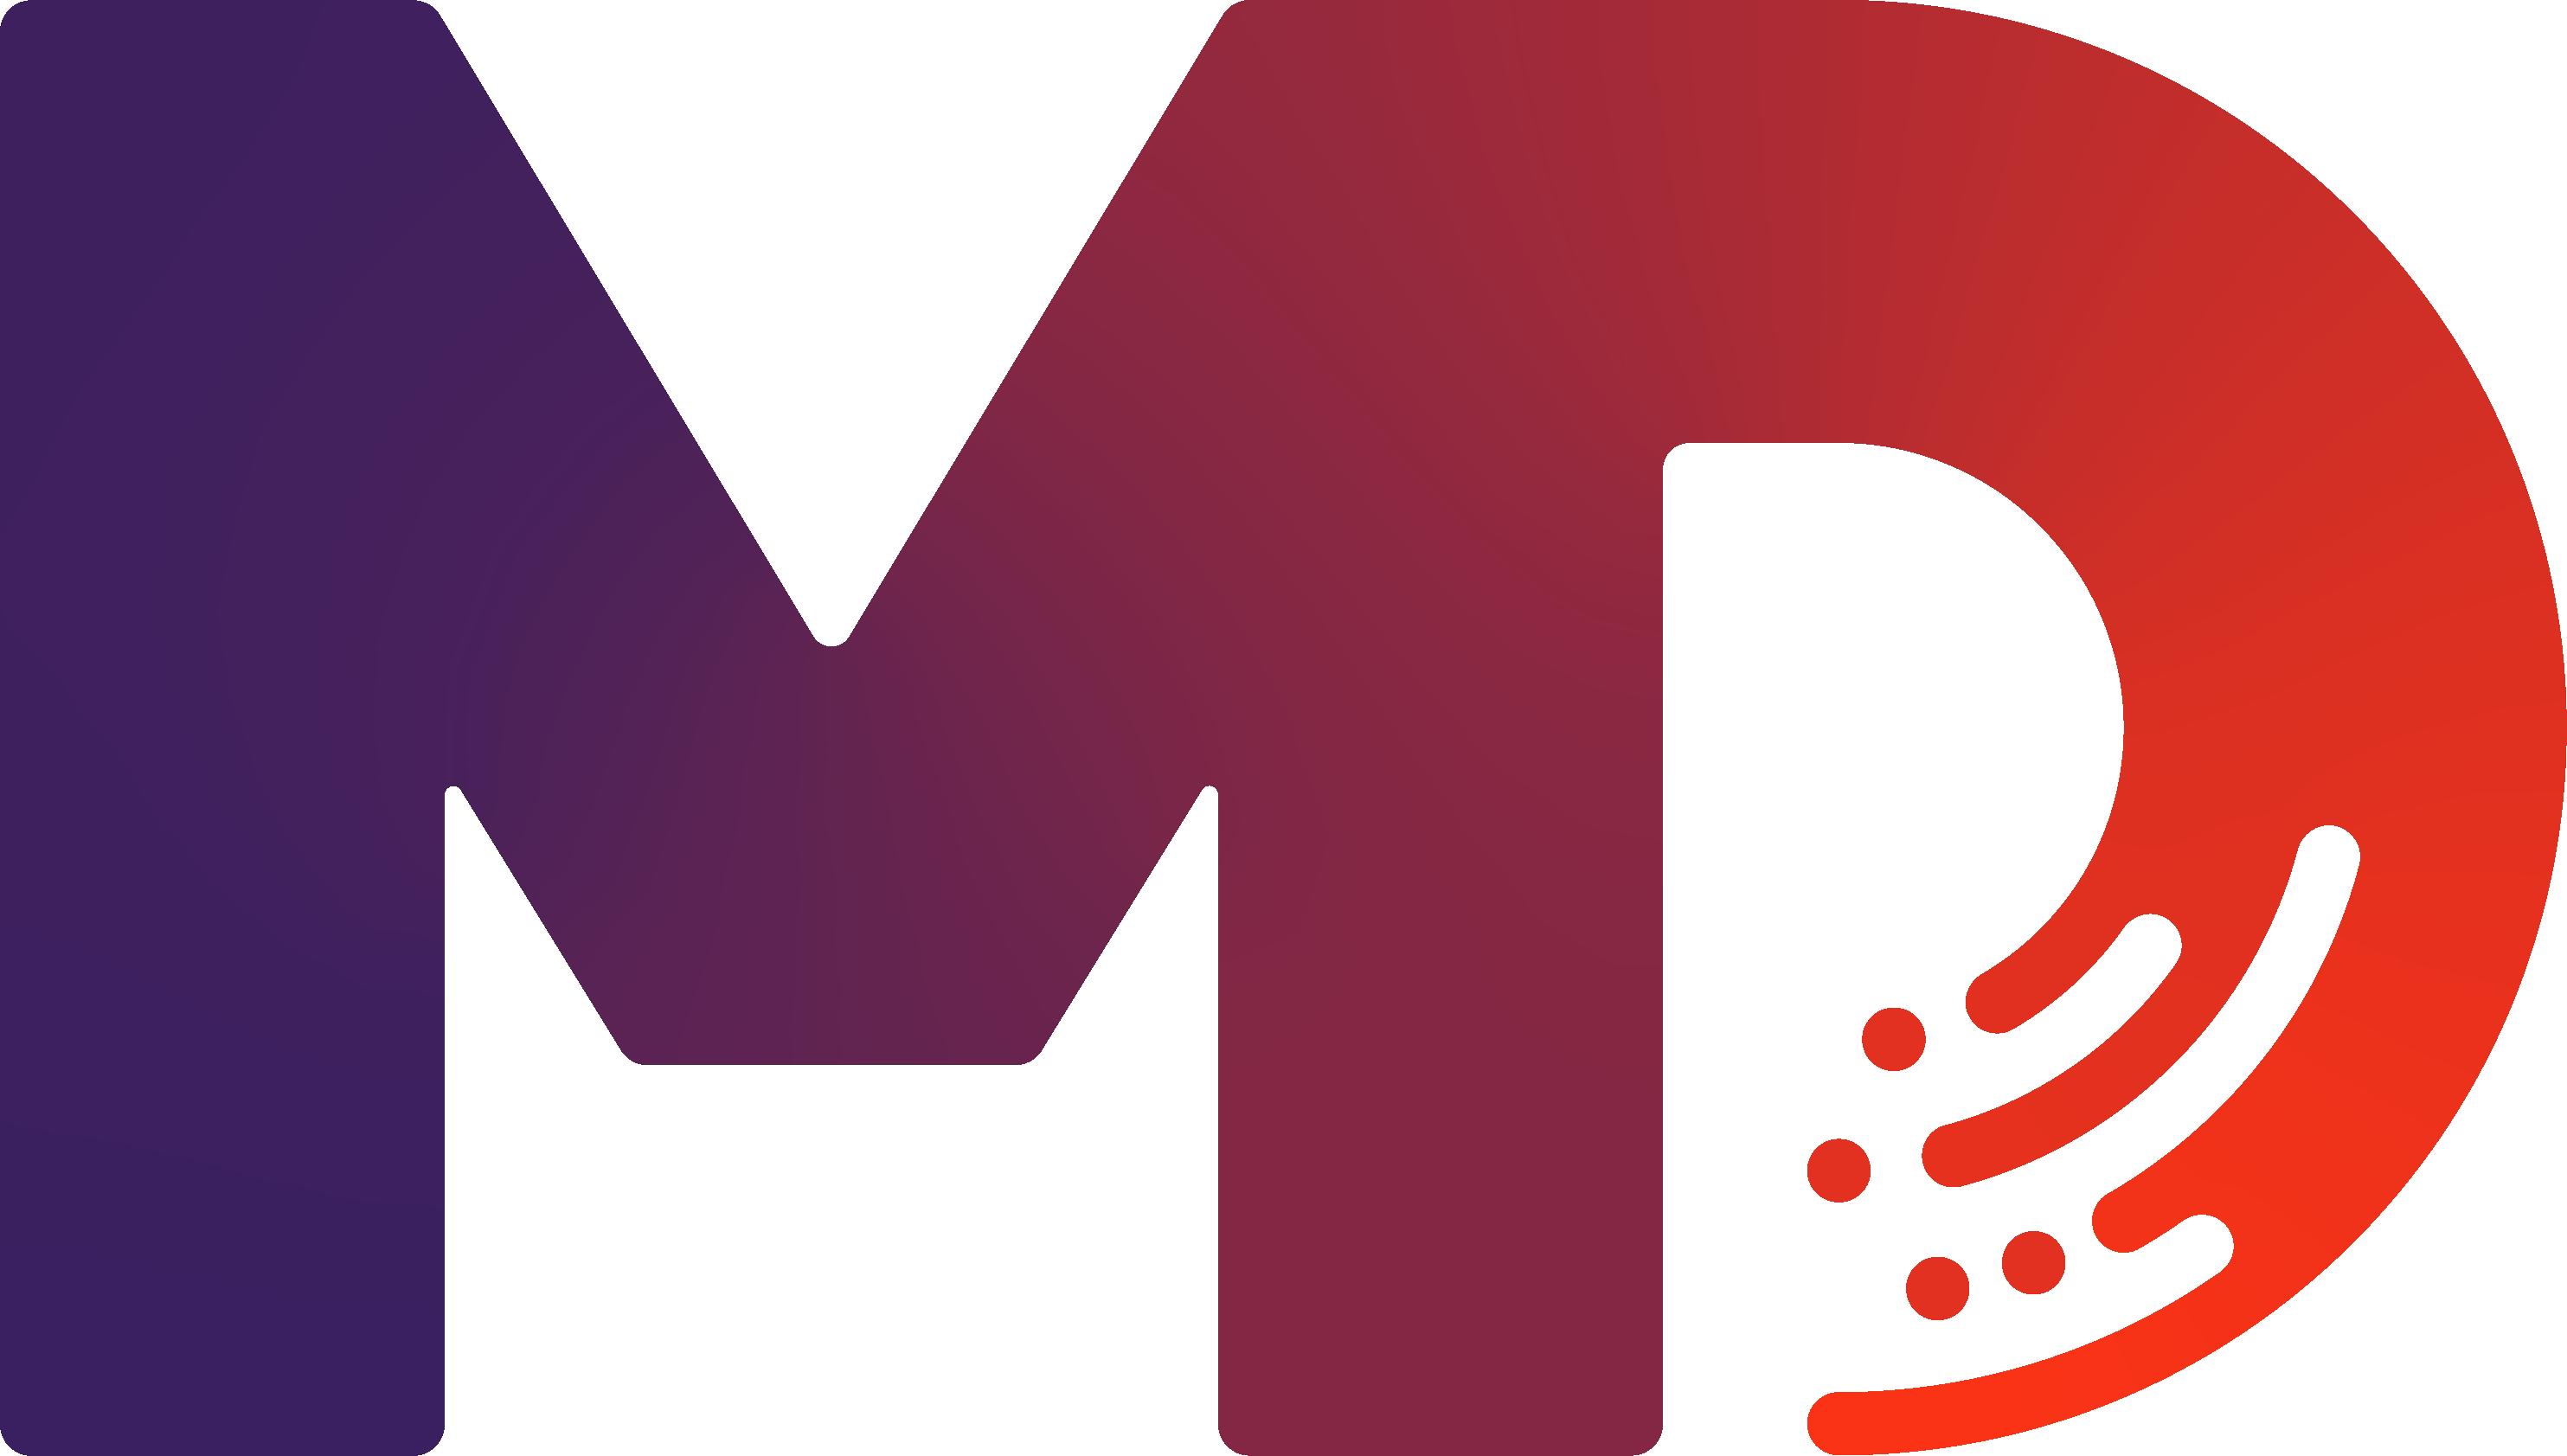 Middlesbrough Digital logo